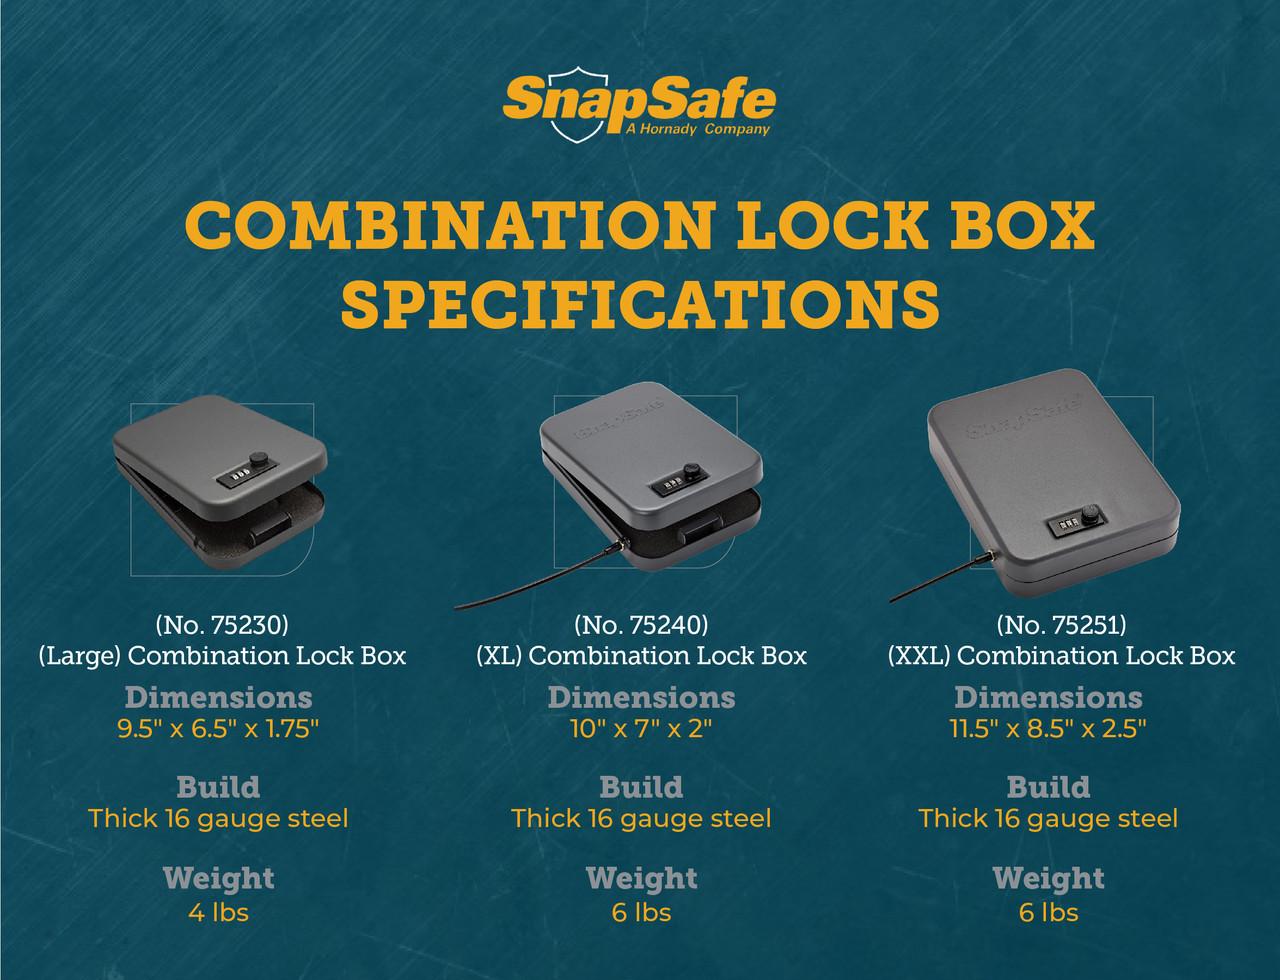 https://d3d71ba2asa5oz.cloudfront.net/23000296/images/snapsafe-lockbox-with-key-lock-for-handgun-storage-of-full-size-pistols-casku18174-7.jpg